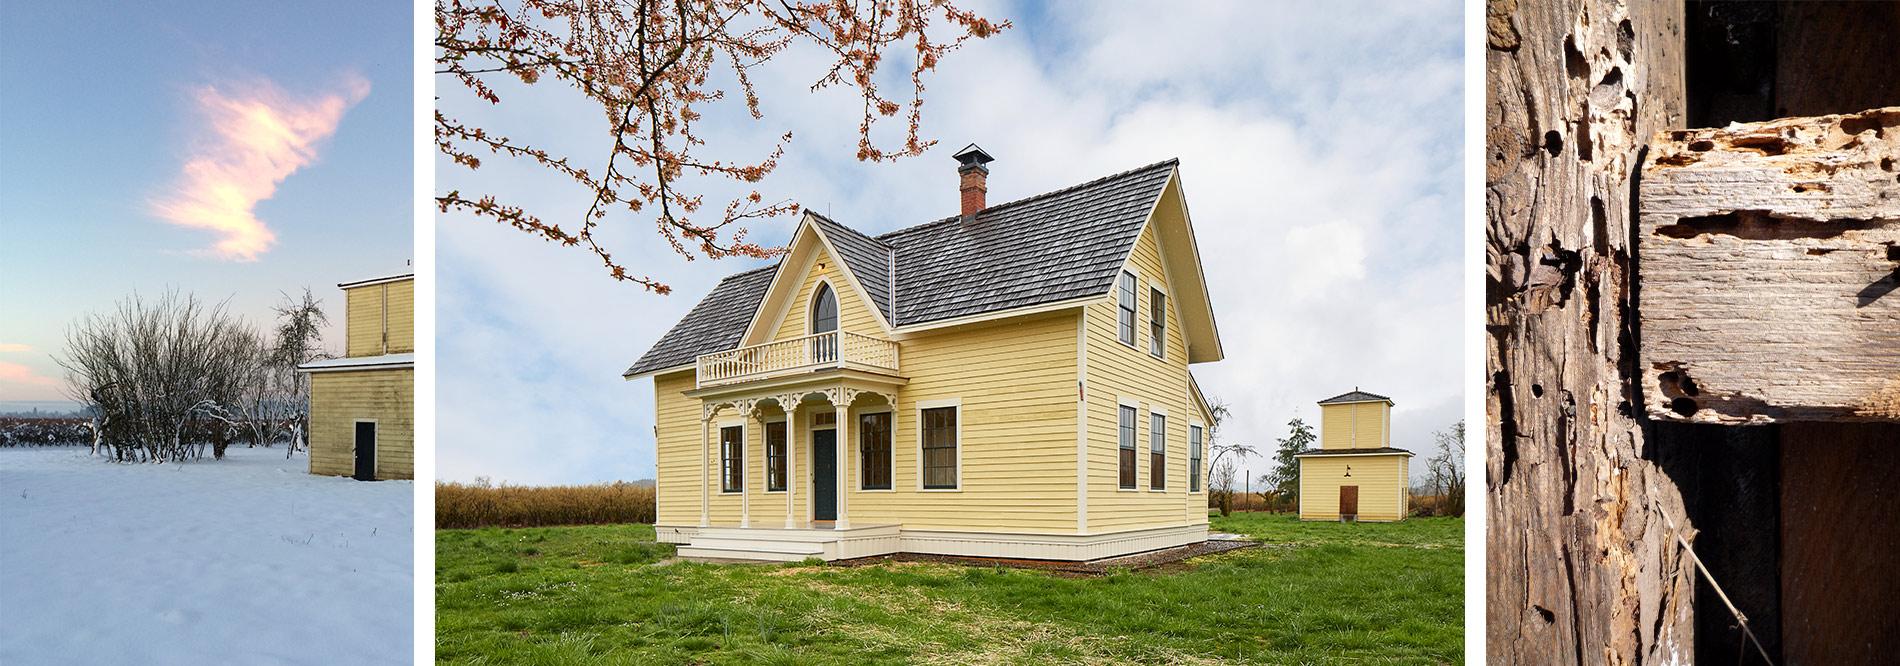 Silas Beeks House